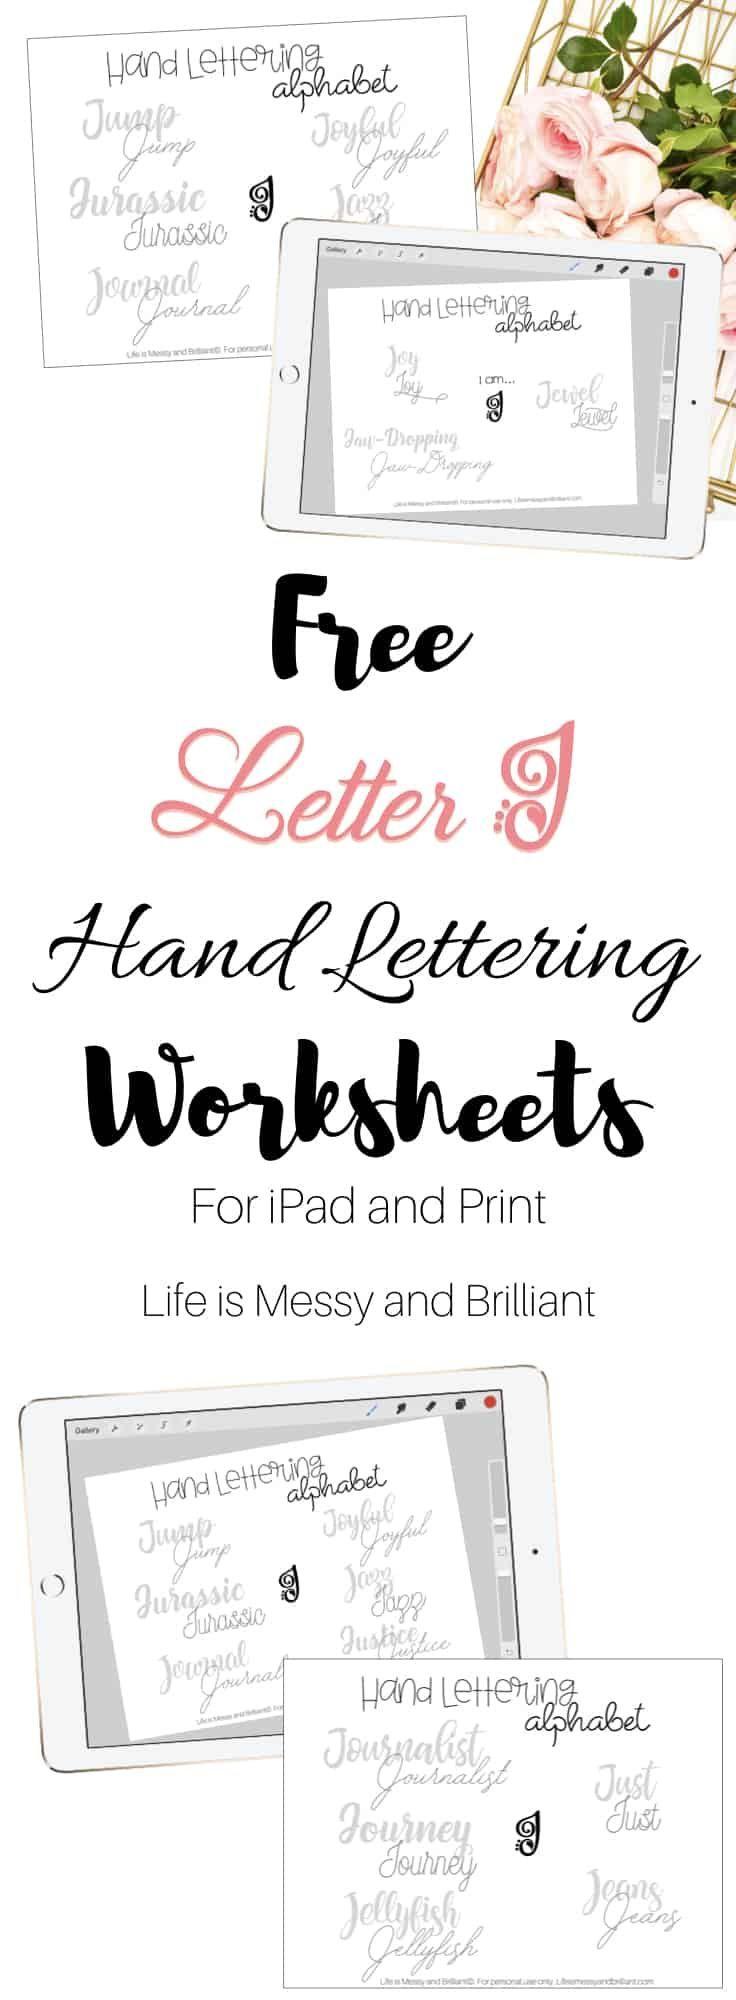 Free Letter J Hand Lettering Alphabet Practice Worksheet Hand Lettering Practice Sheets Hand Lettering Worksheet Lettering [ 2000 x 736 Pixel ]